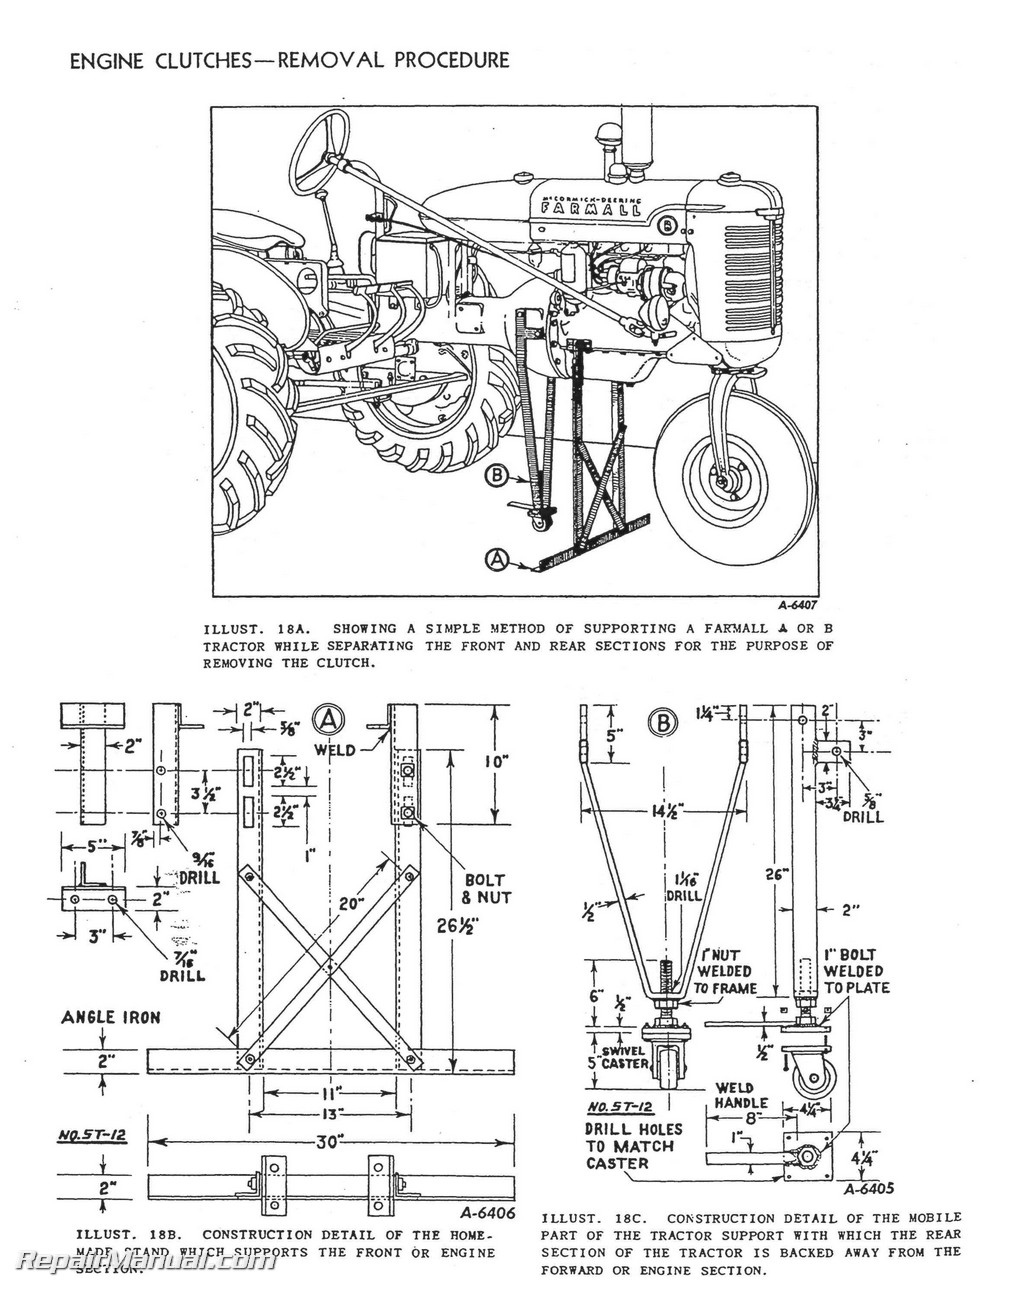 1948 farmall h wiring diagram ng 5837  farmall h tractor wiring diagram on farmall cub  tractor wiring diagram on farmall cub